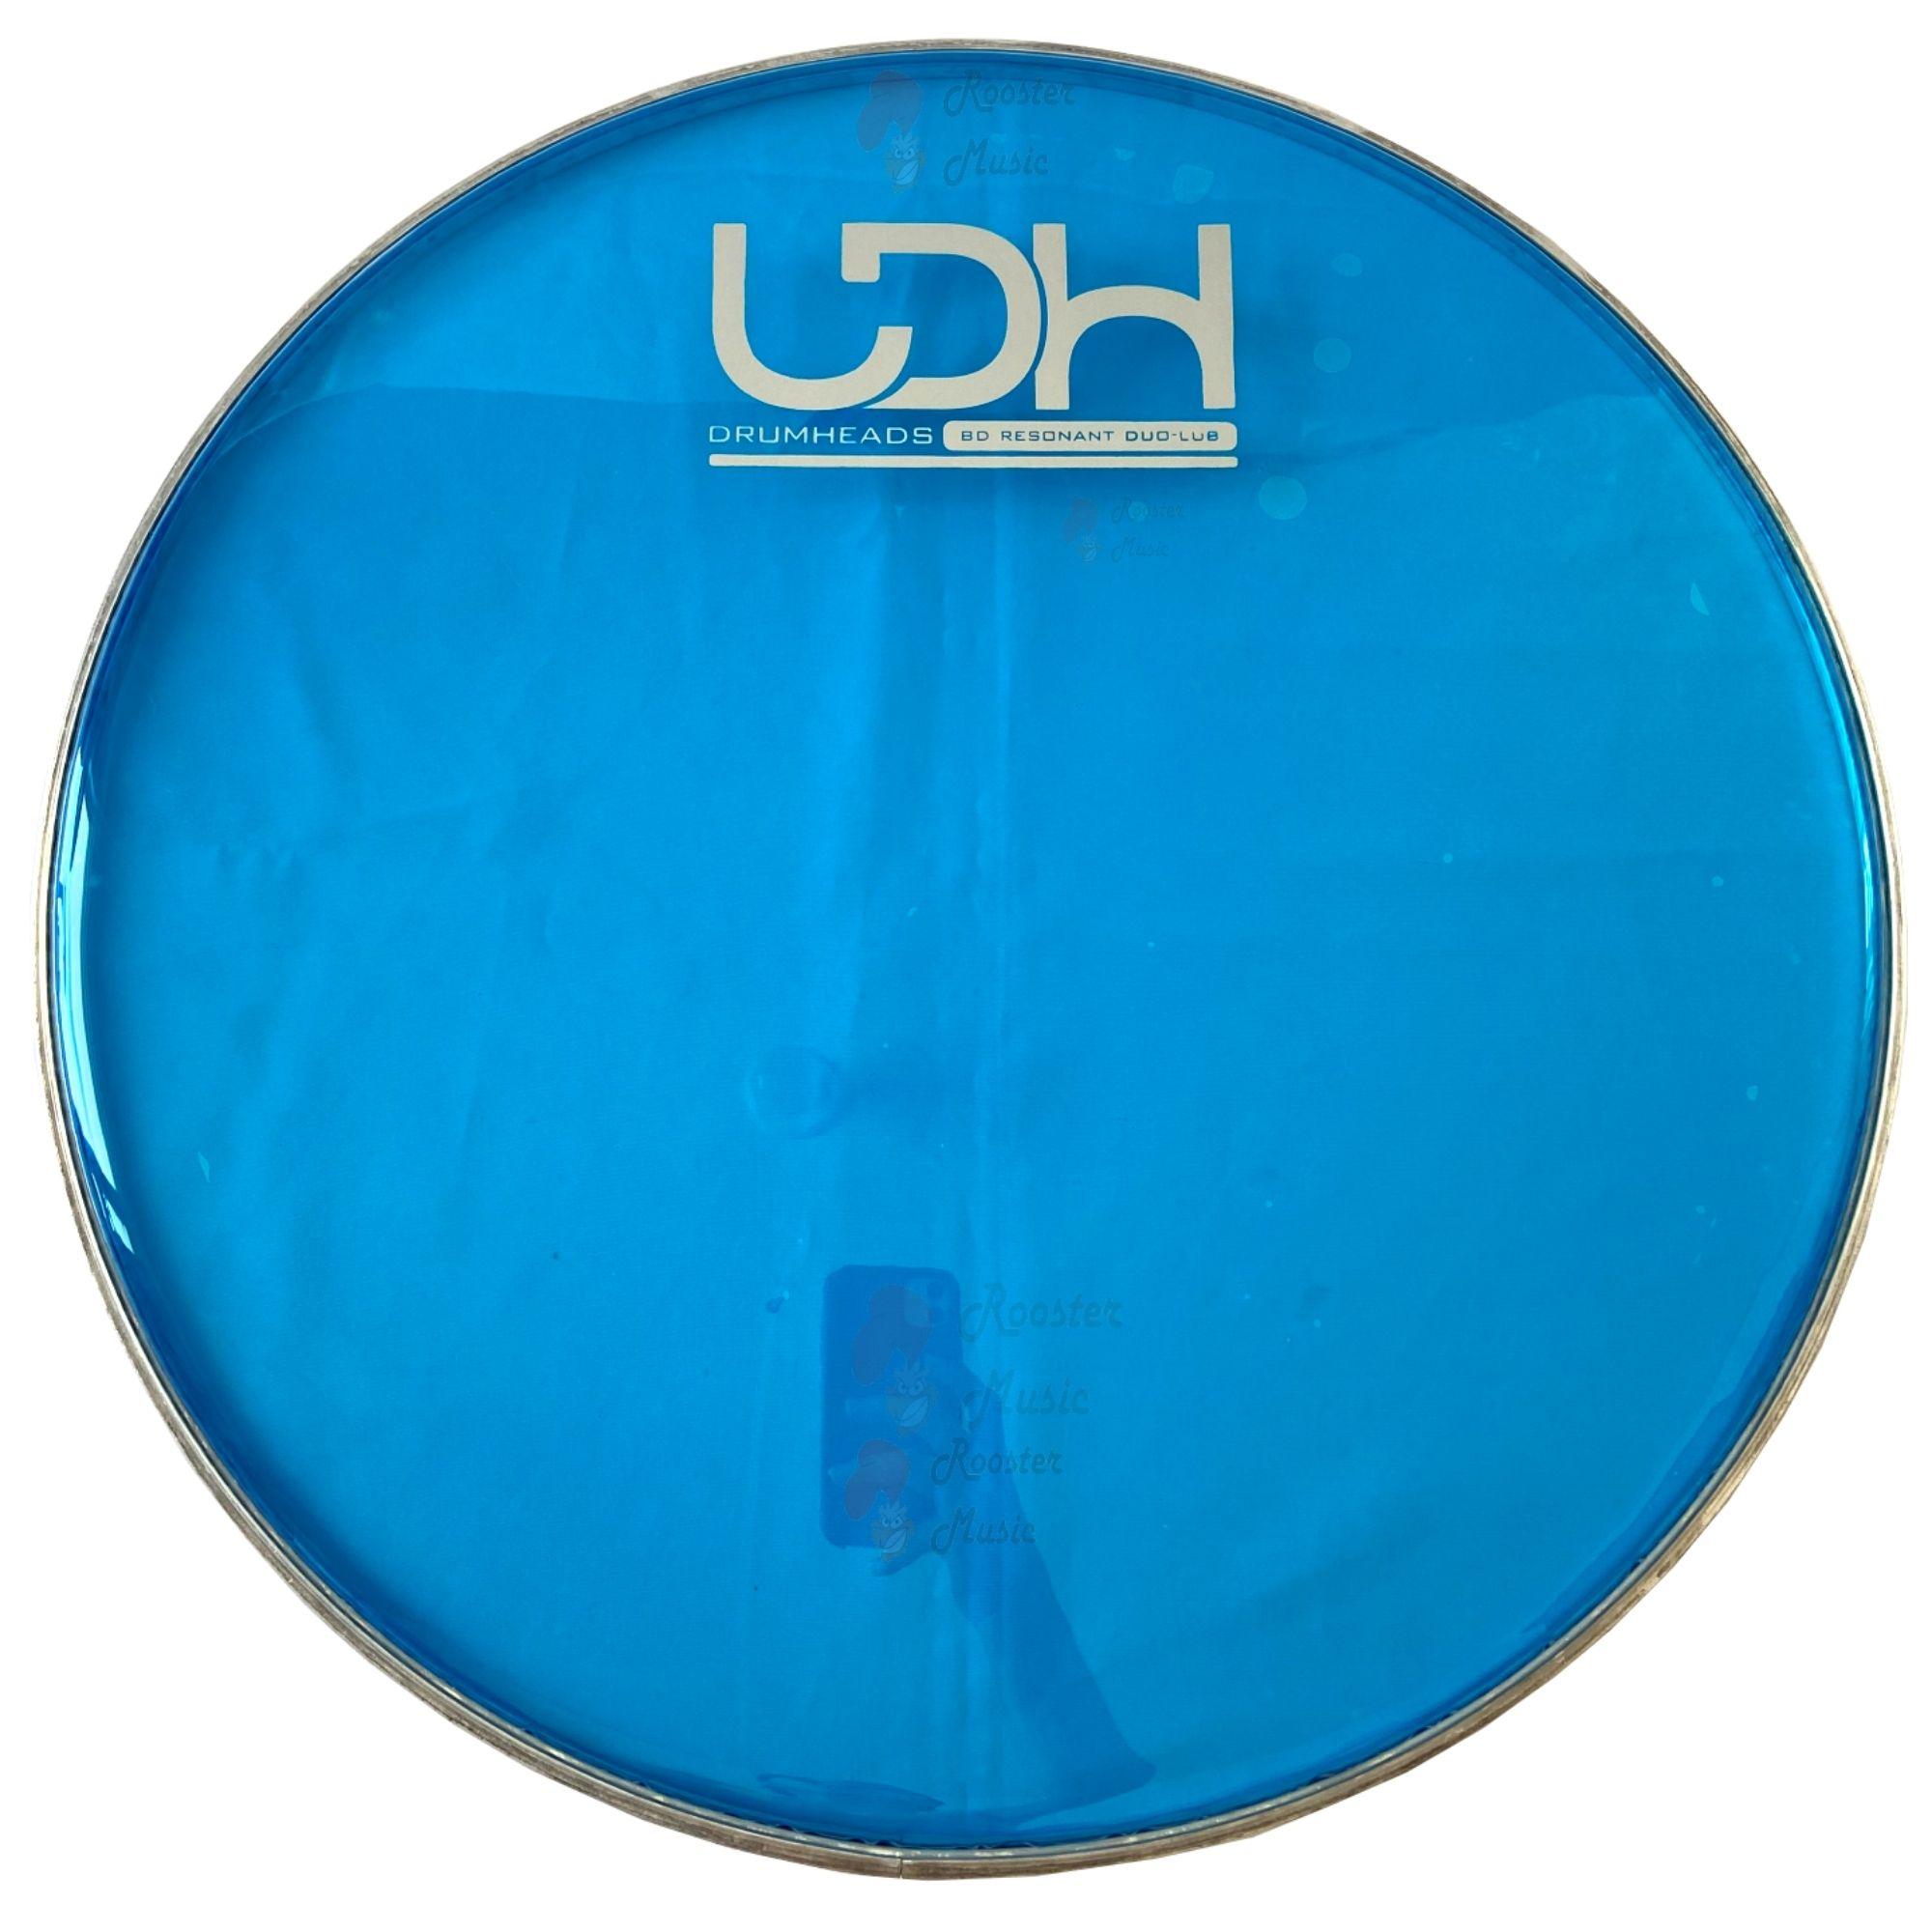 "Pele Hidráulica Duo Lub Clear Luen Drumheads LDH 12"" para Bateria."